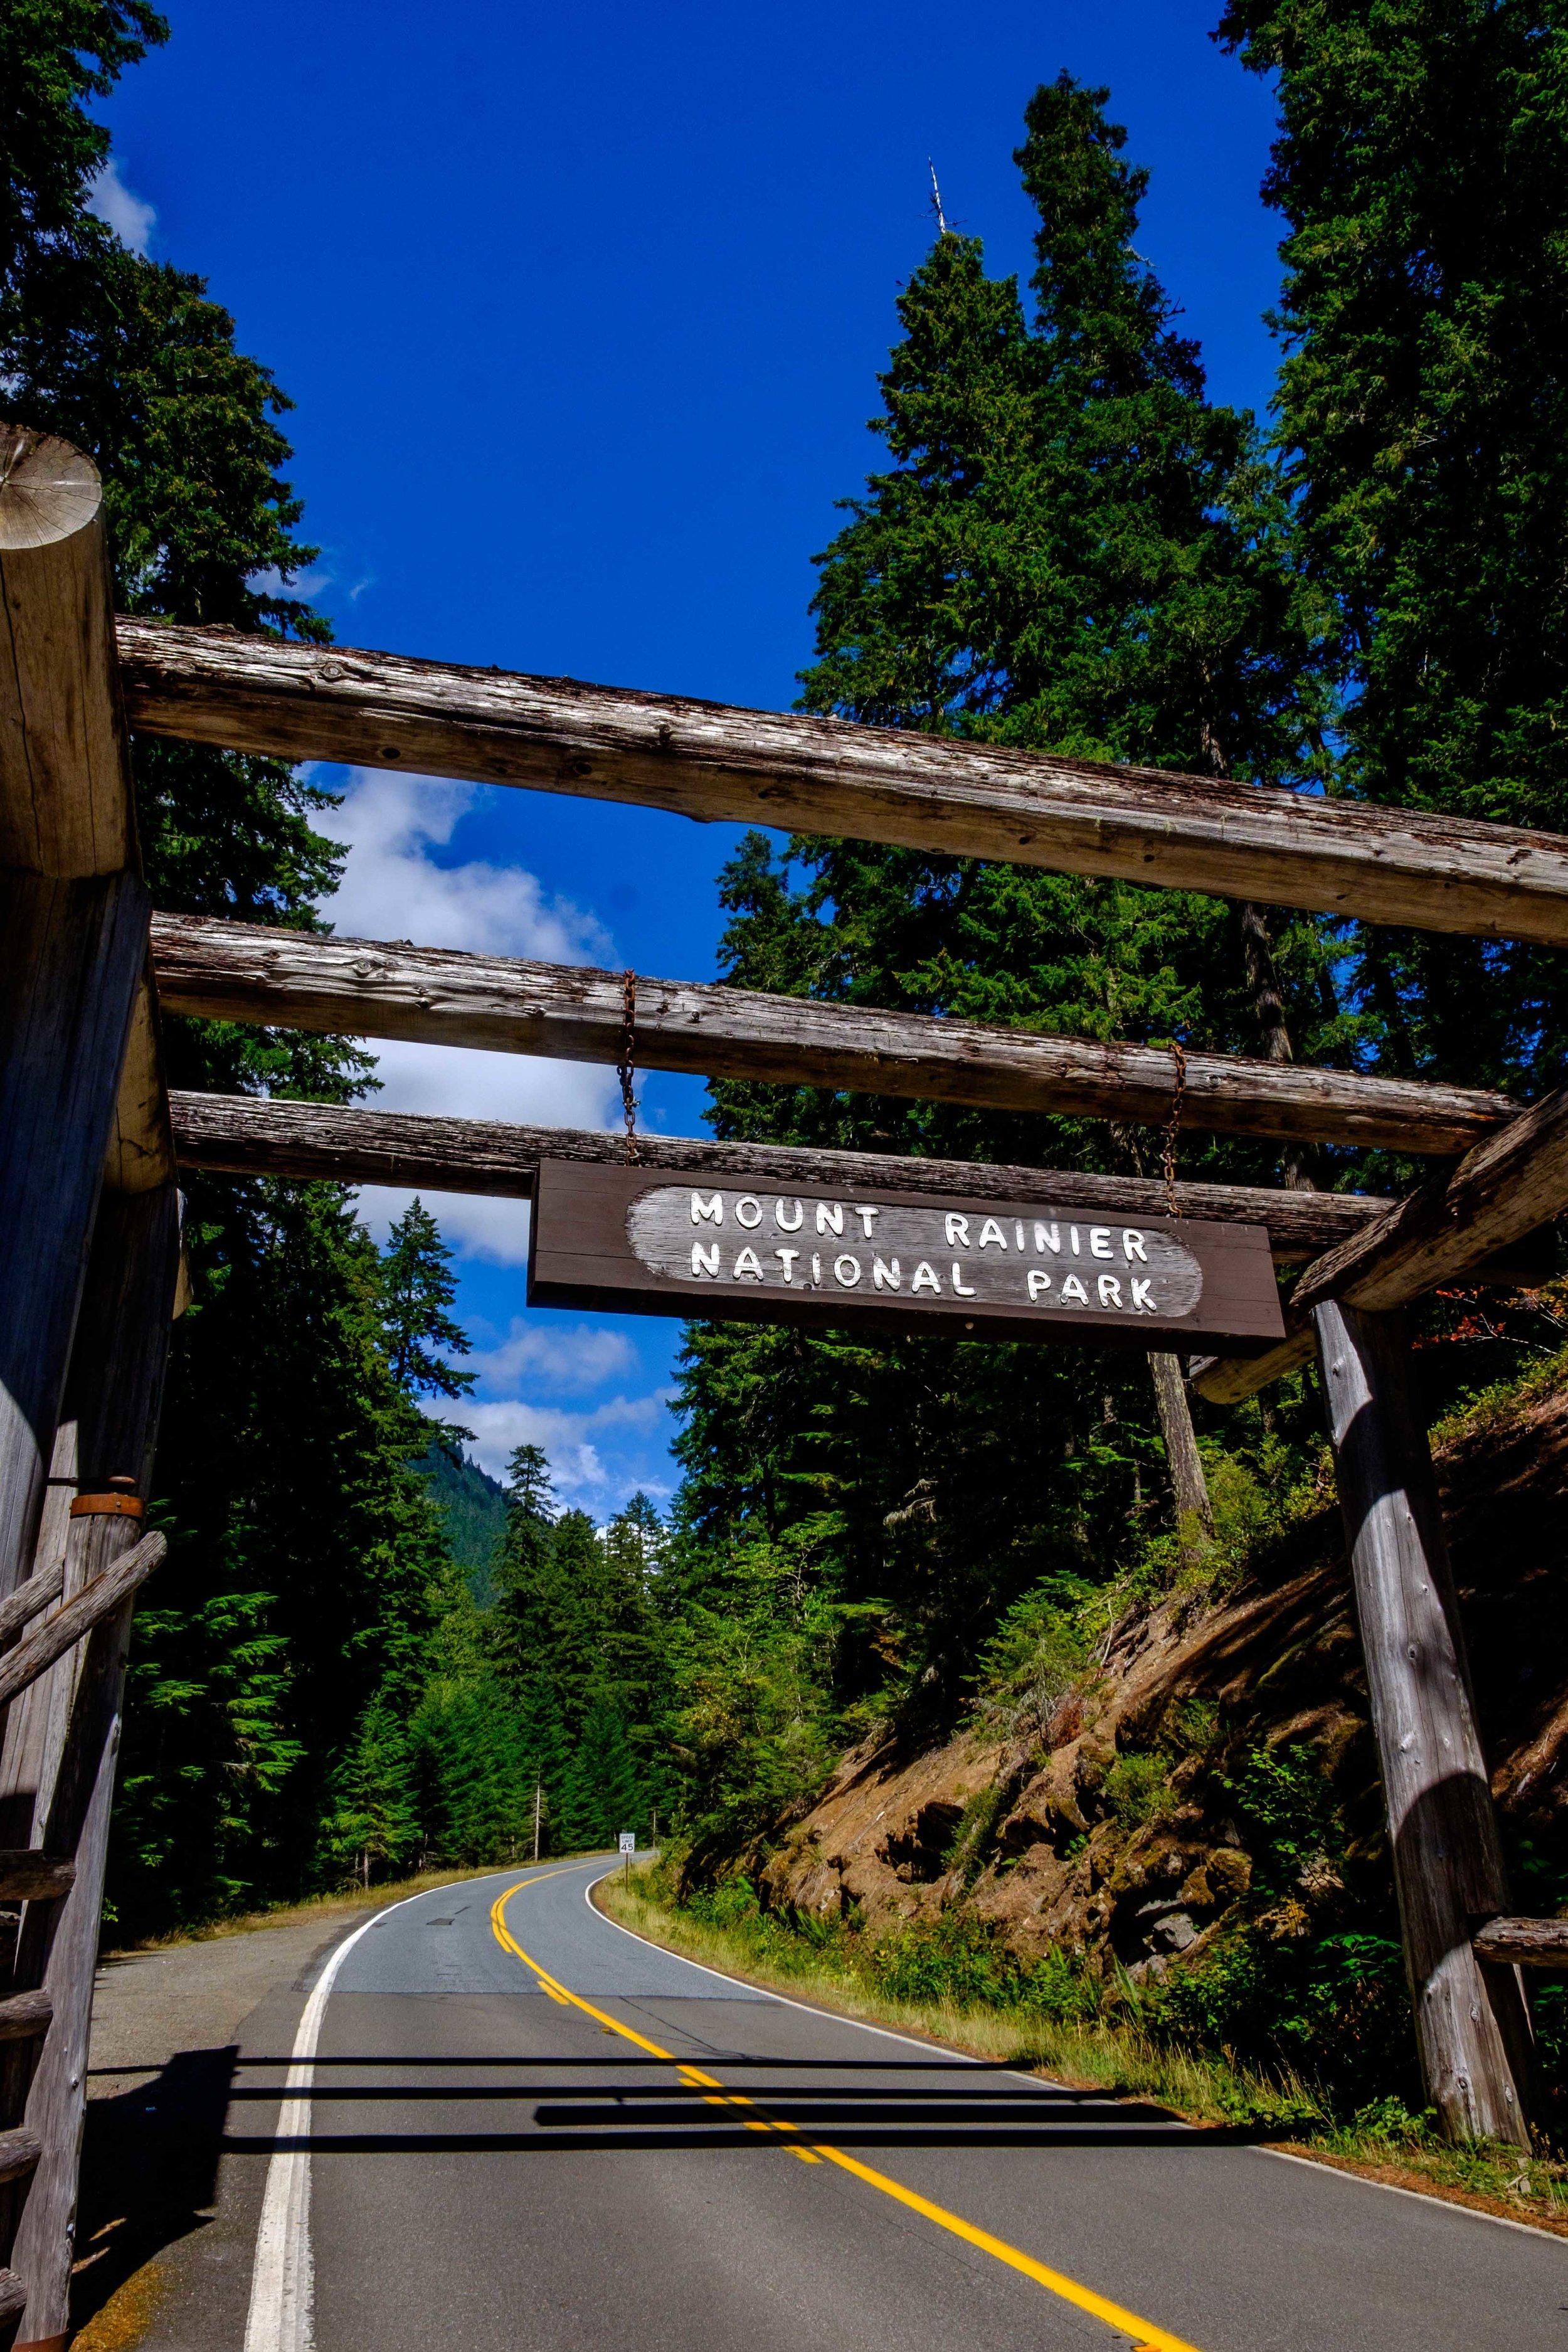 20160904-SP-Mount Rainier National Park-_DSF2134 2.jpg